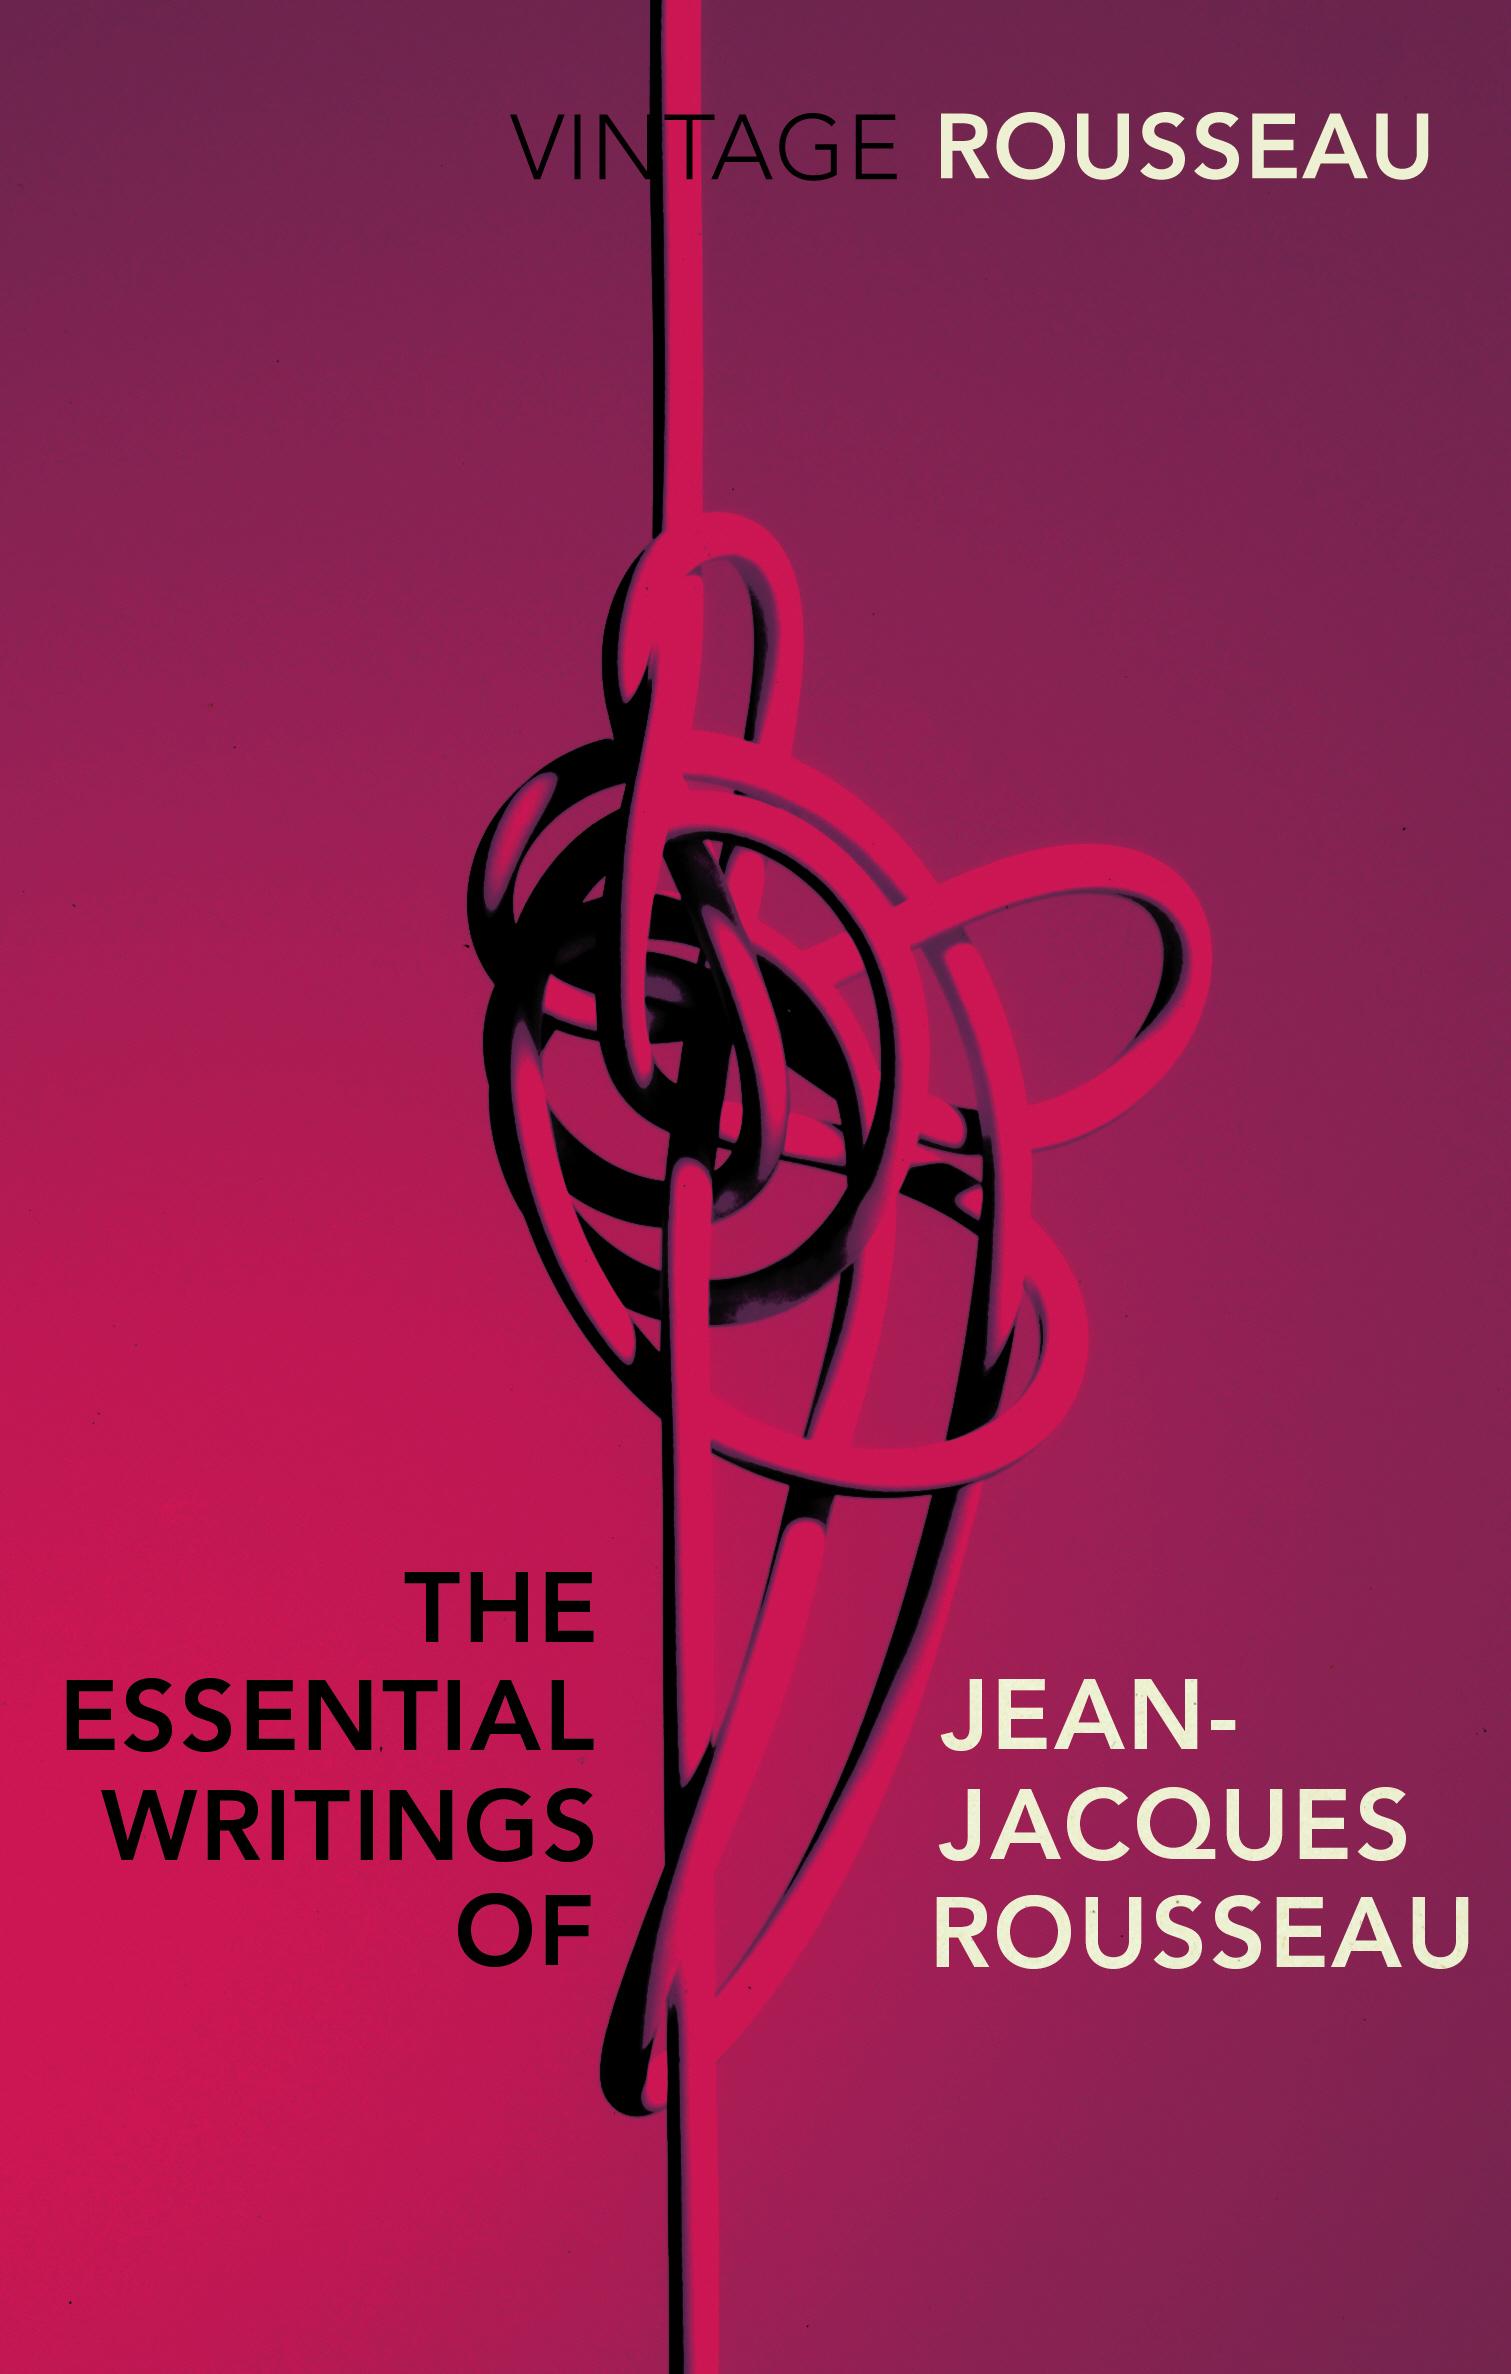 jean jacques rousseau writings